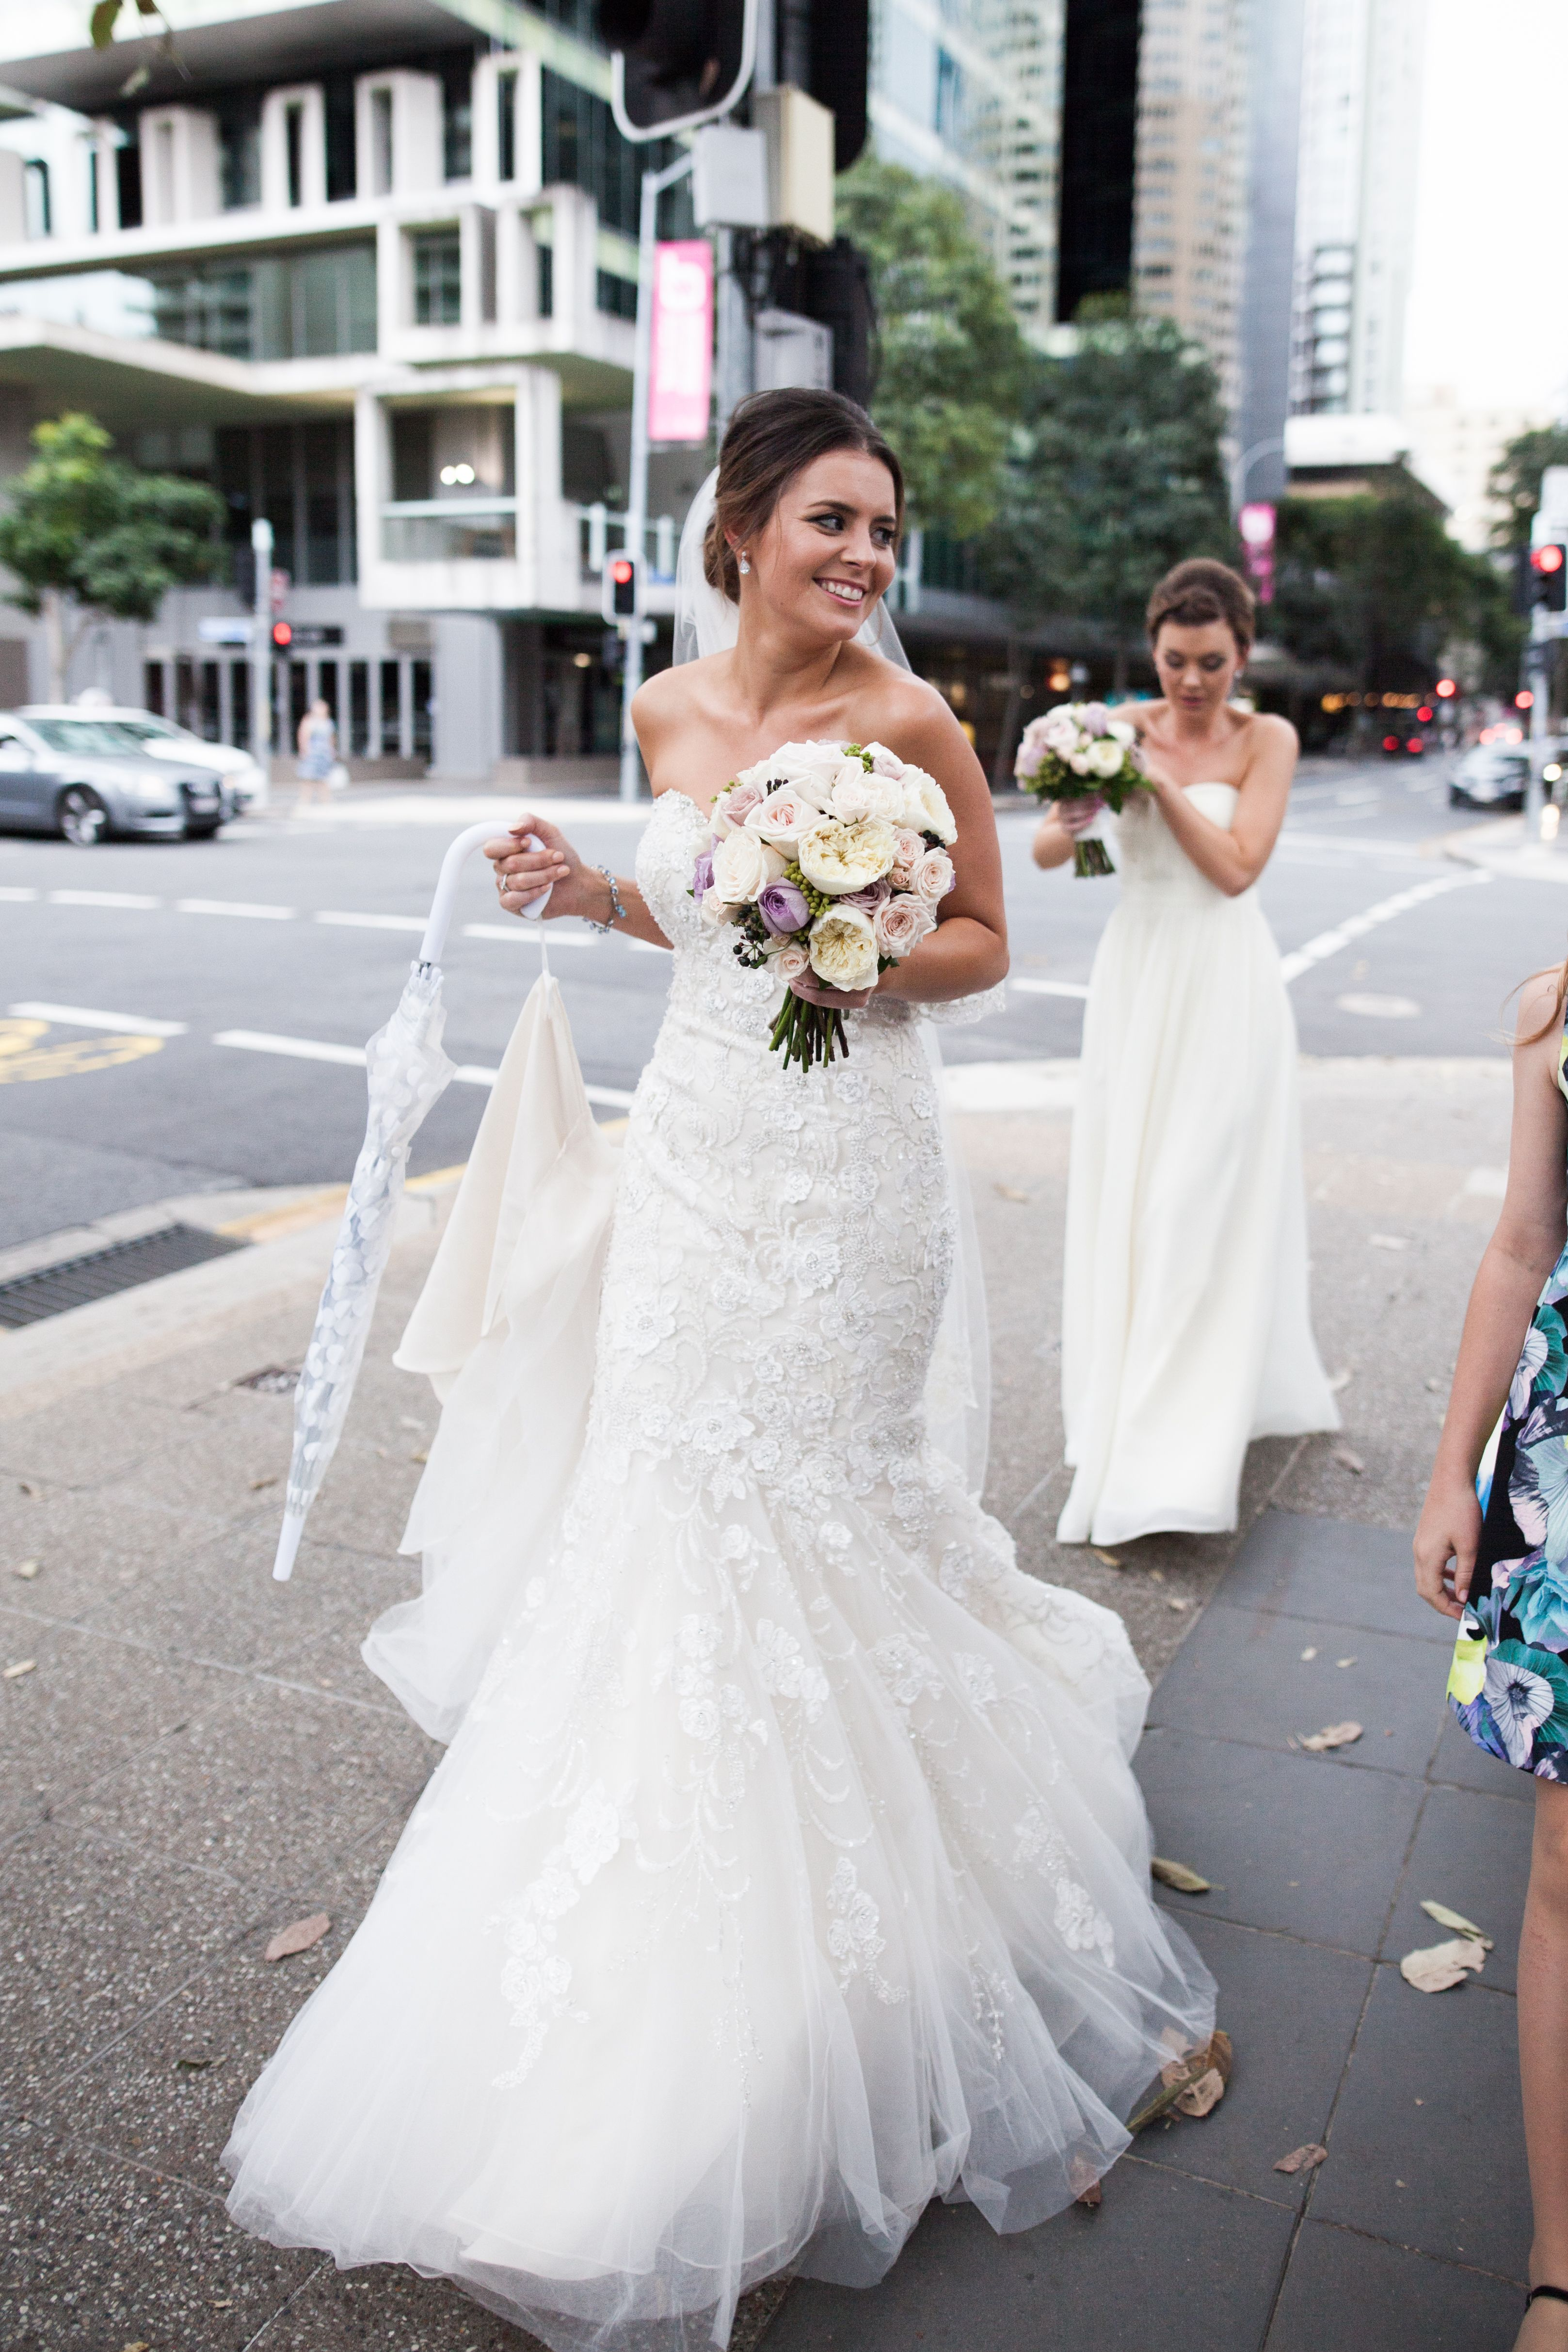 Wlc Real Bride Samara Wearing Her Mori Lee Chanel Wedding Dress Exclusive To White Lily Couture Yo White Wedding Dresses Wedding Dresses Mermaid Wedding Dress [ 4851 x 3234 Pixel ]